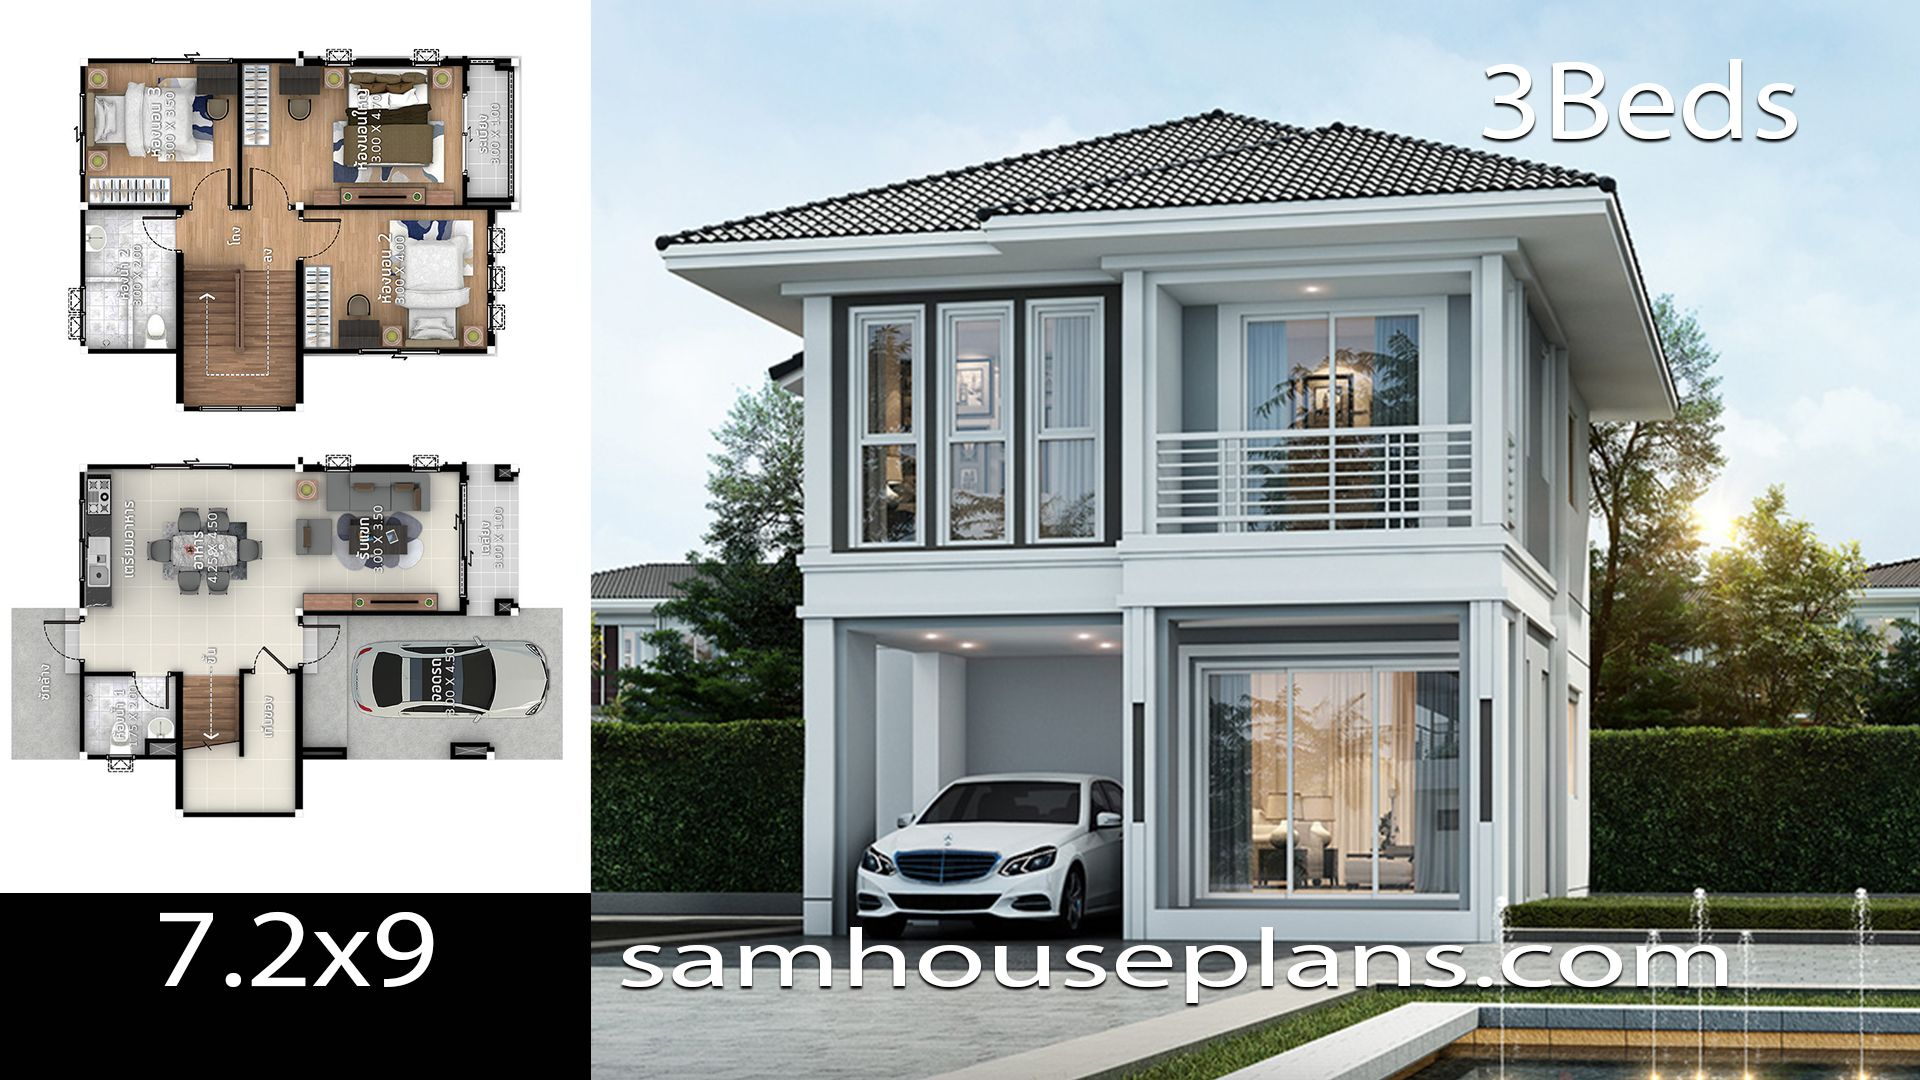 House Plans Idea 7 2x9 With 3 Bedrooms Sam House Plans In 2020 Bungalow House Design Minimalist House Design House Plans